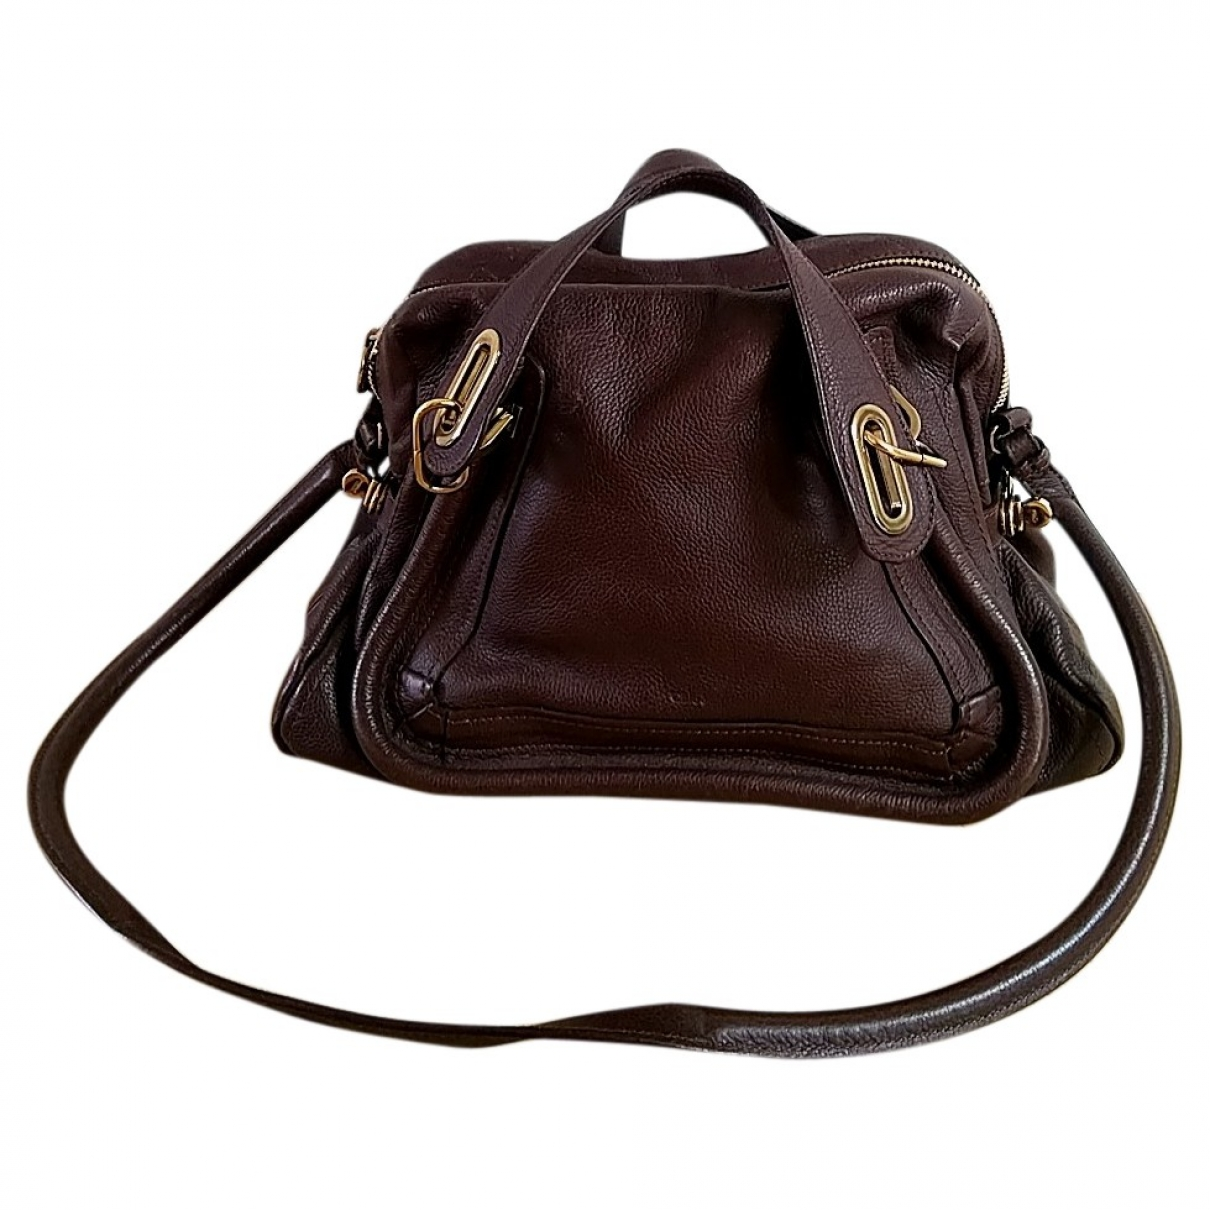 Chloé Paraty Brown Leather handbag for Women \N